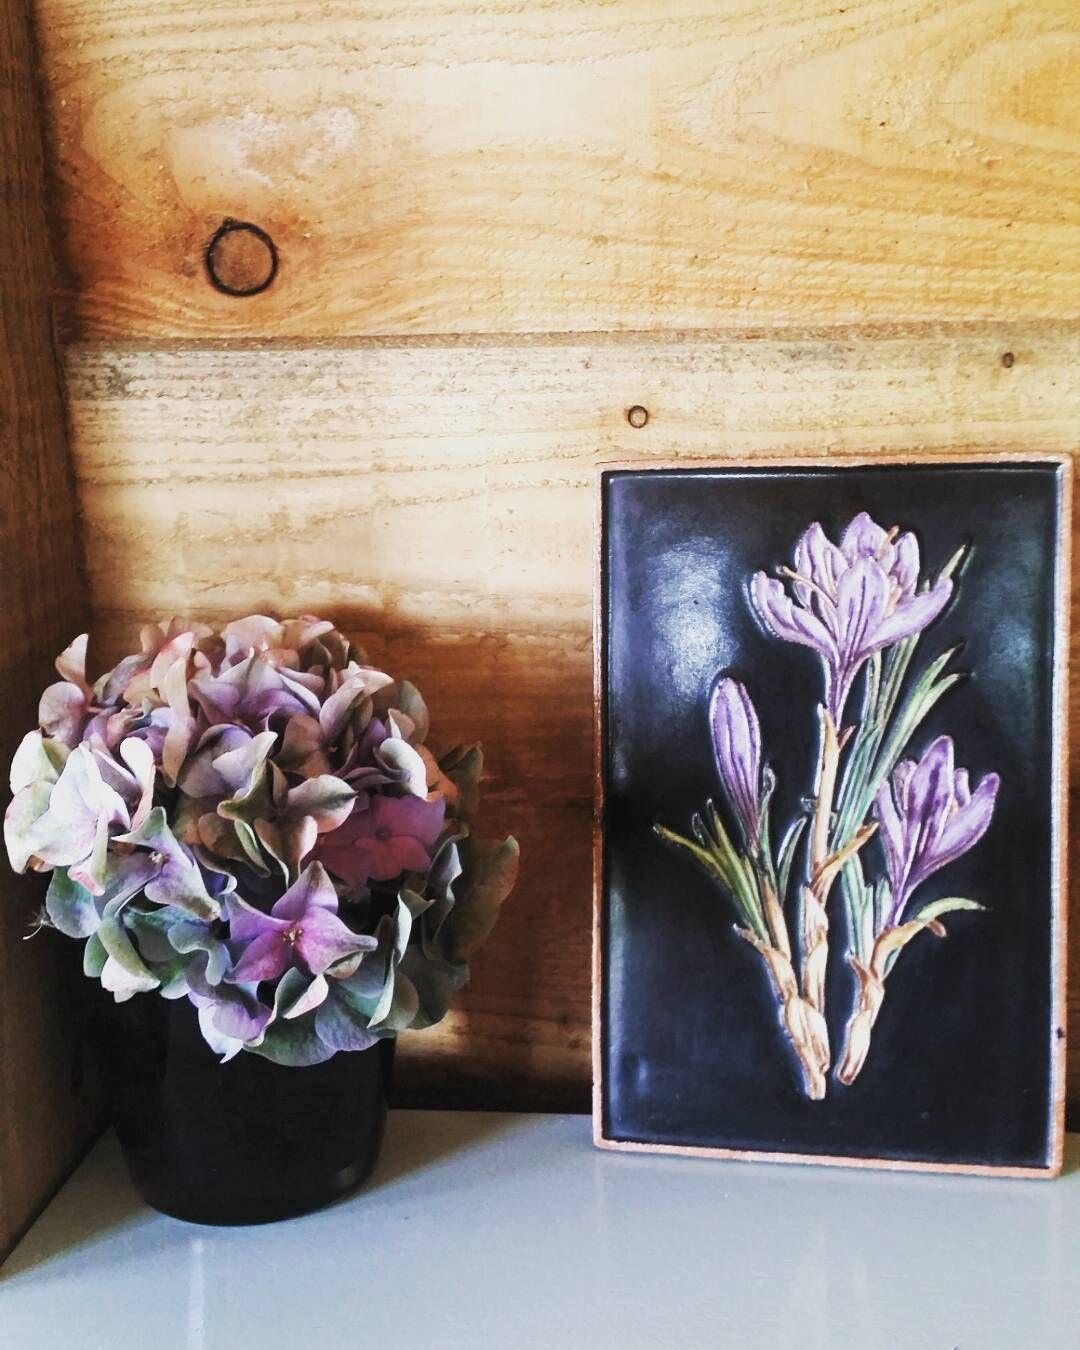 #karlsruhe #majolika #ceramic #tile #walldecor #Westgermany #flowers #hydrangea #homedecor #original #vintage #forsale by retro_loco